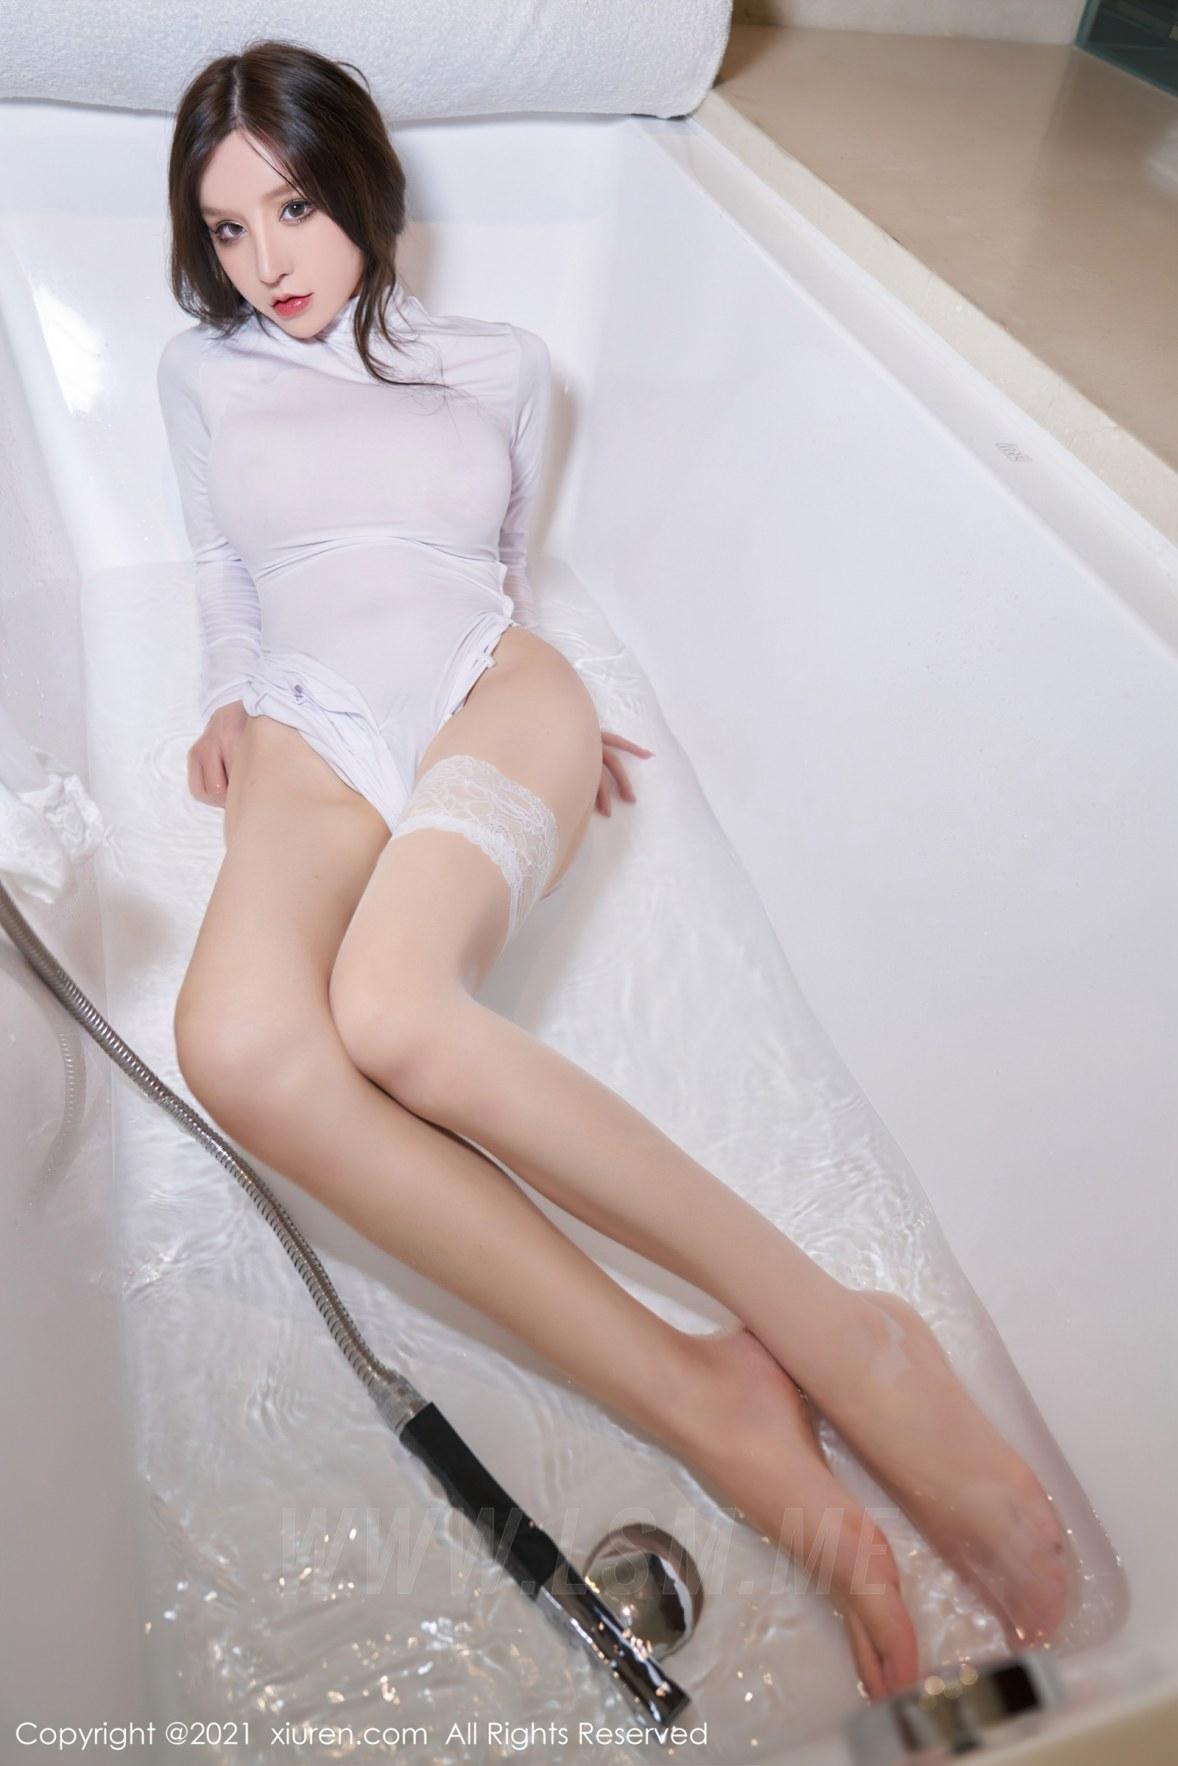 3680 087 omf 3603 5400 - XiuRen 秀人 No.3680 浴室蕾丝袜 周于希Sandy 性感写真111 - 秀人网 -【免费在线写真】【丽人丝语】